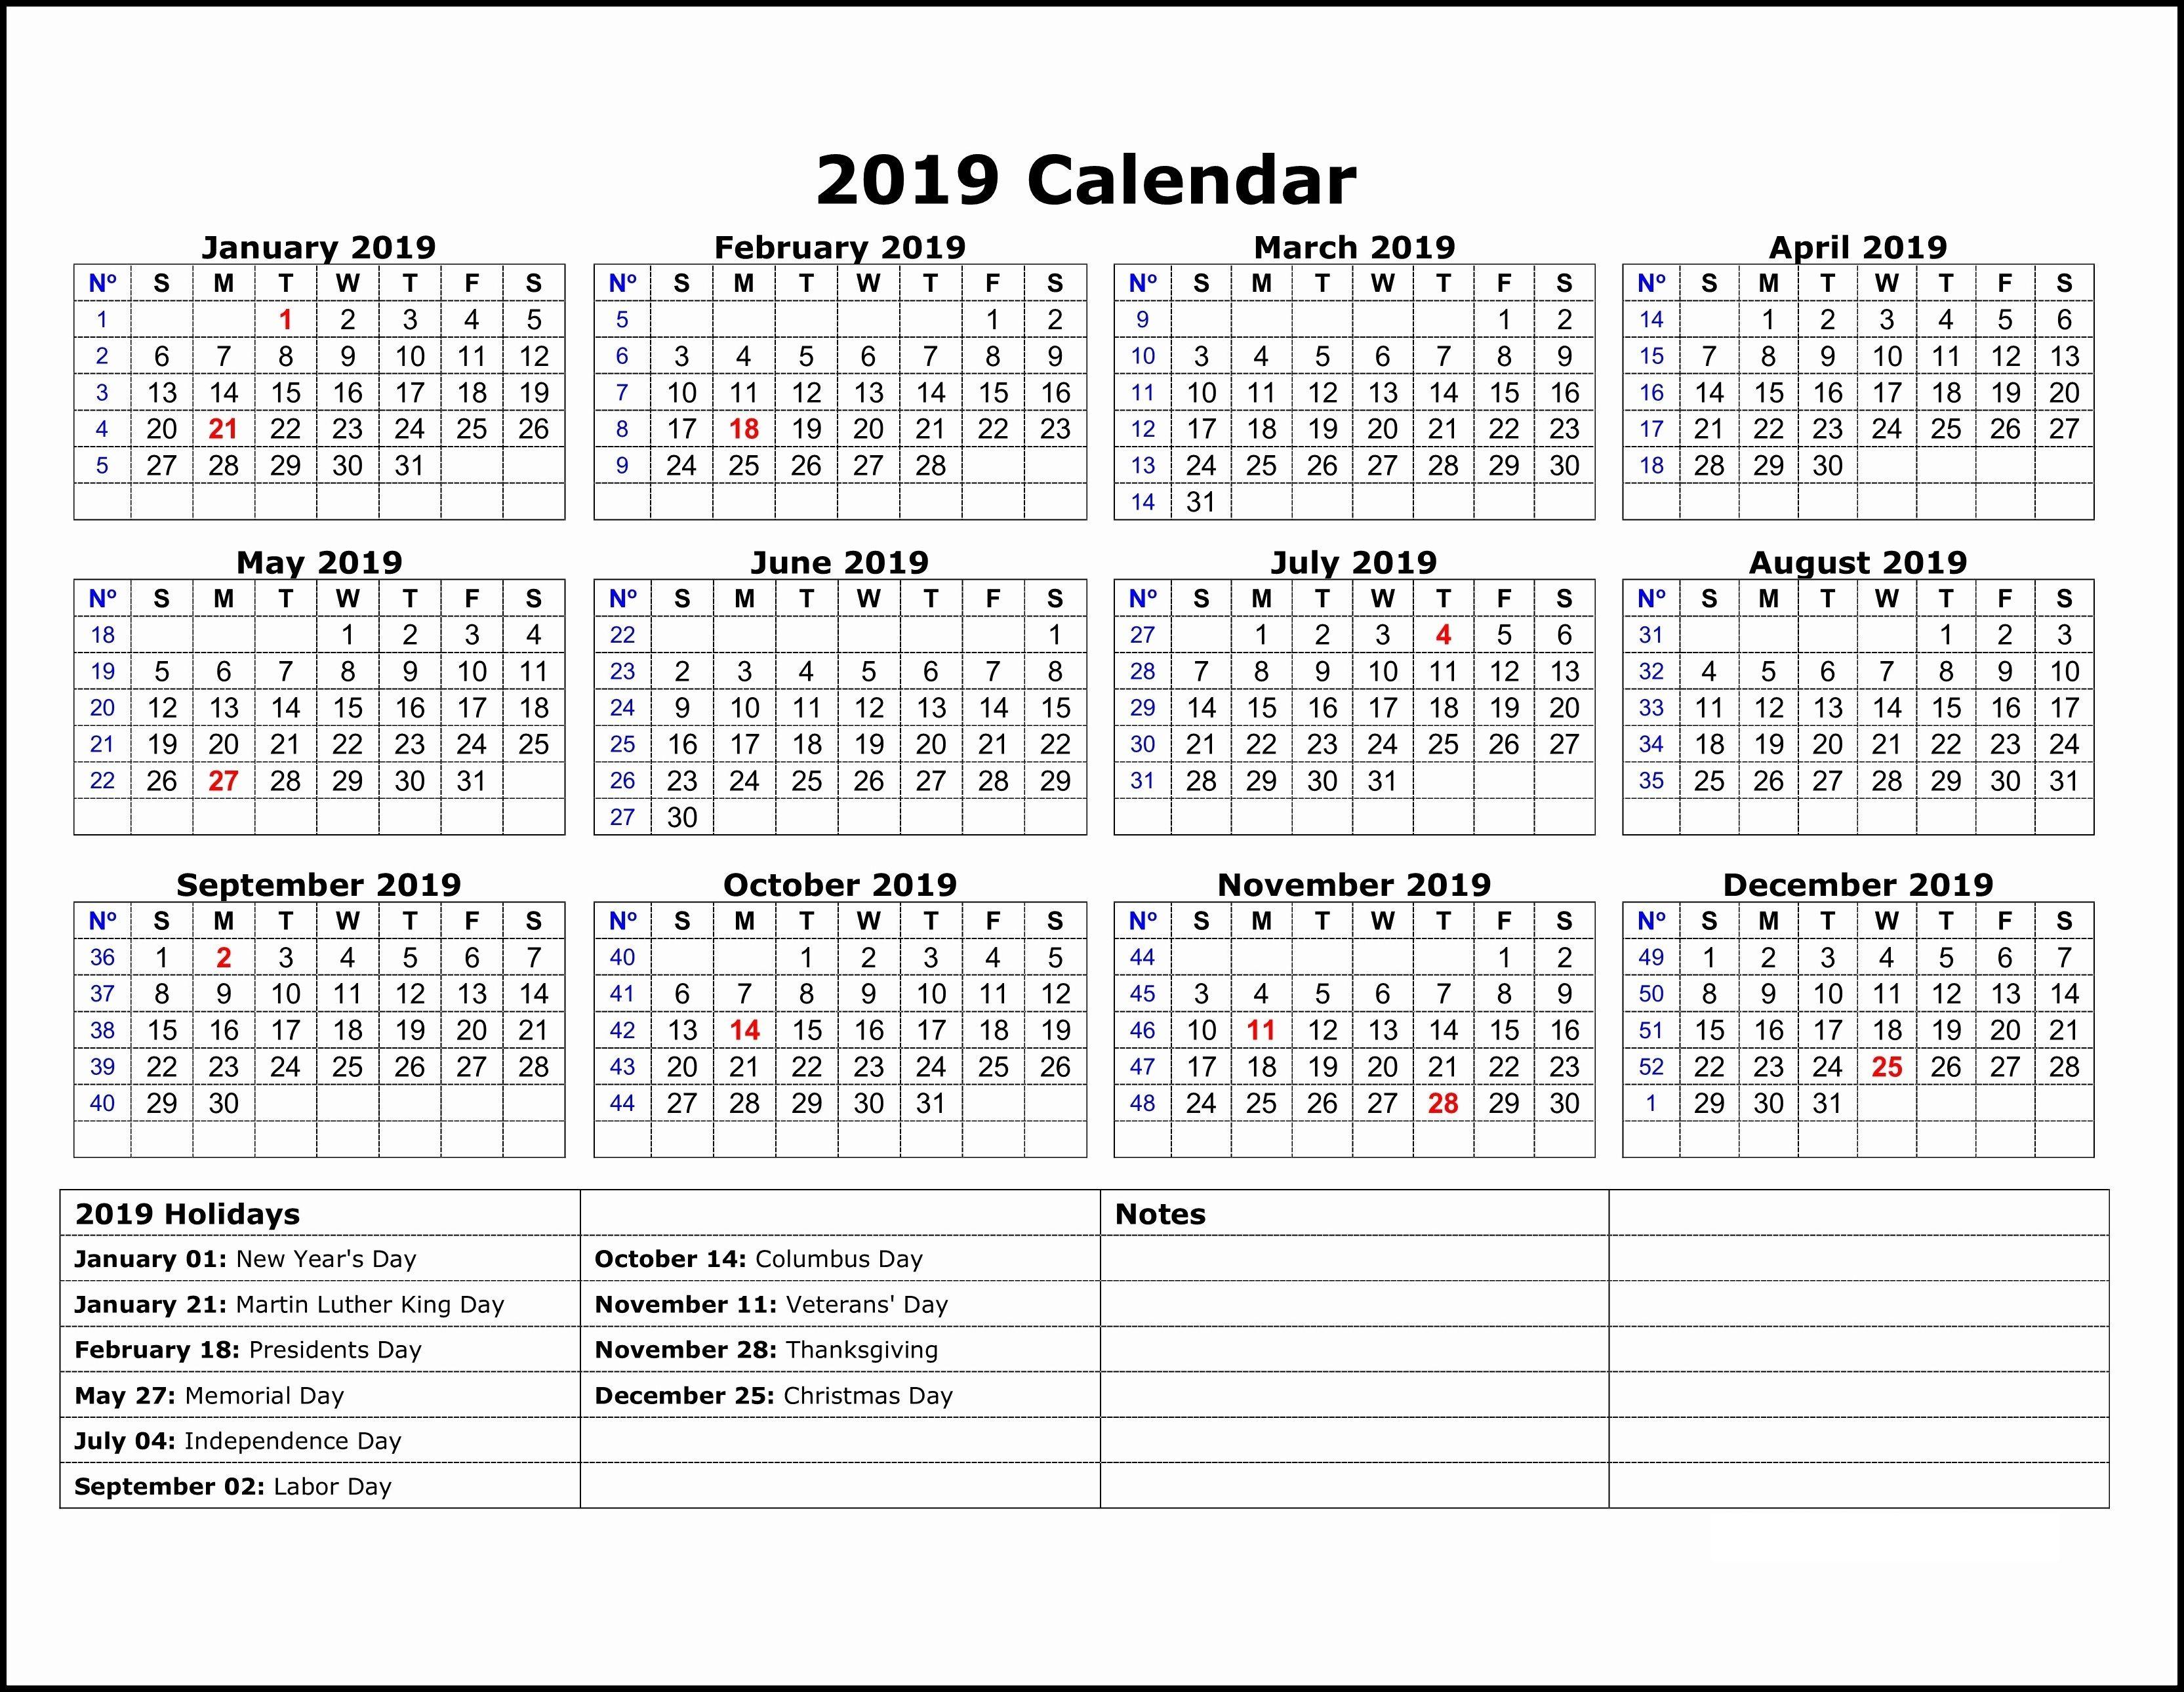 2019 Calendar Template One Note | 2019 Calendar Template In One with Monthly Calendar Template Printable Notes